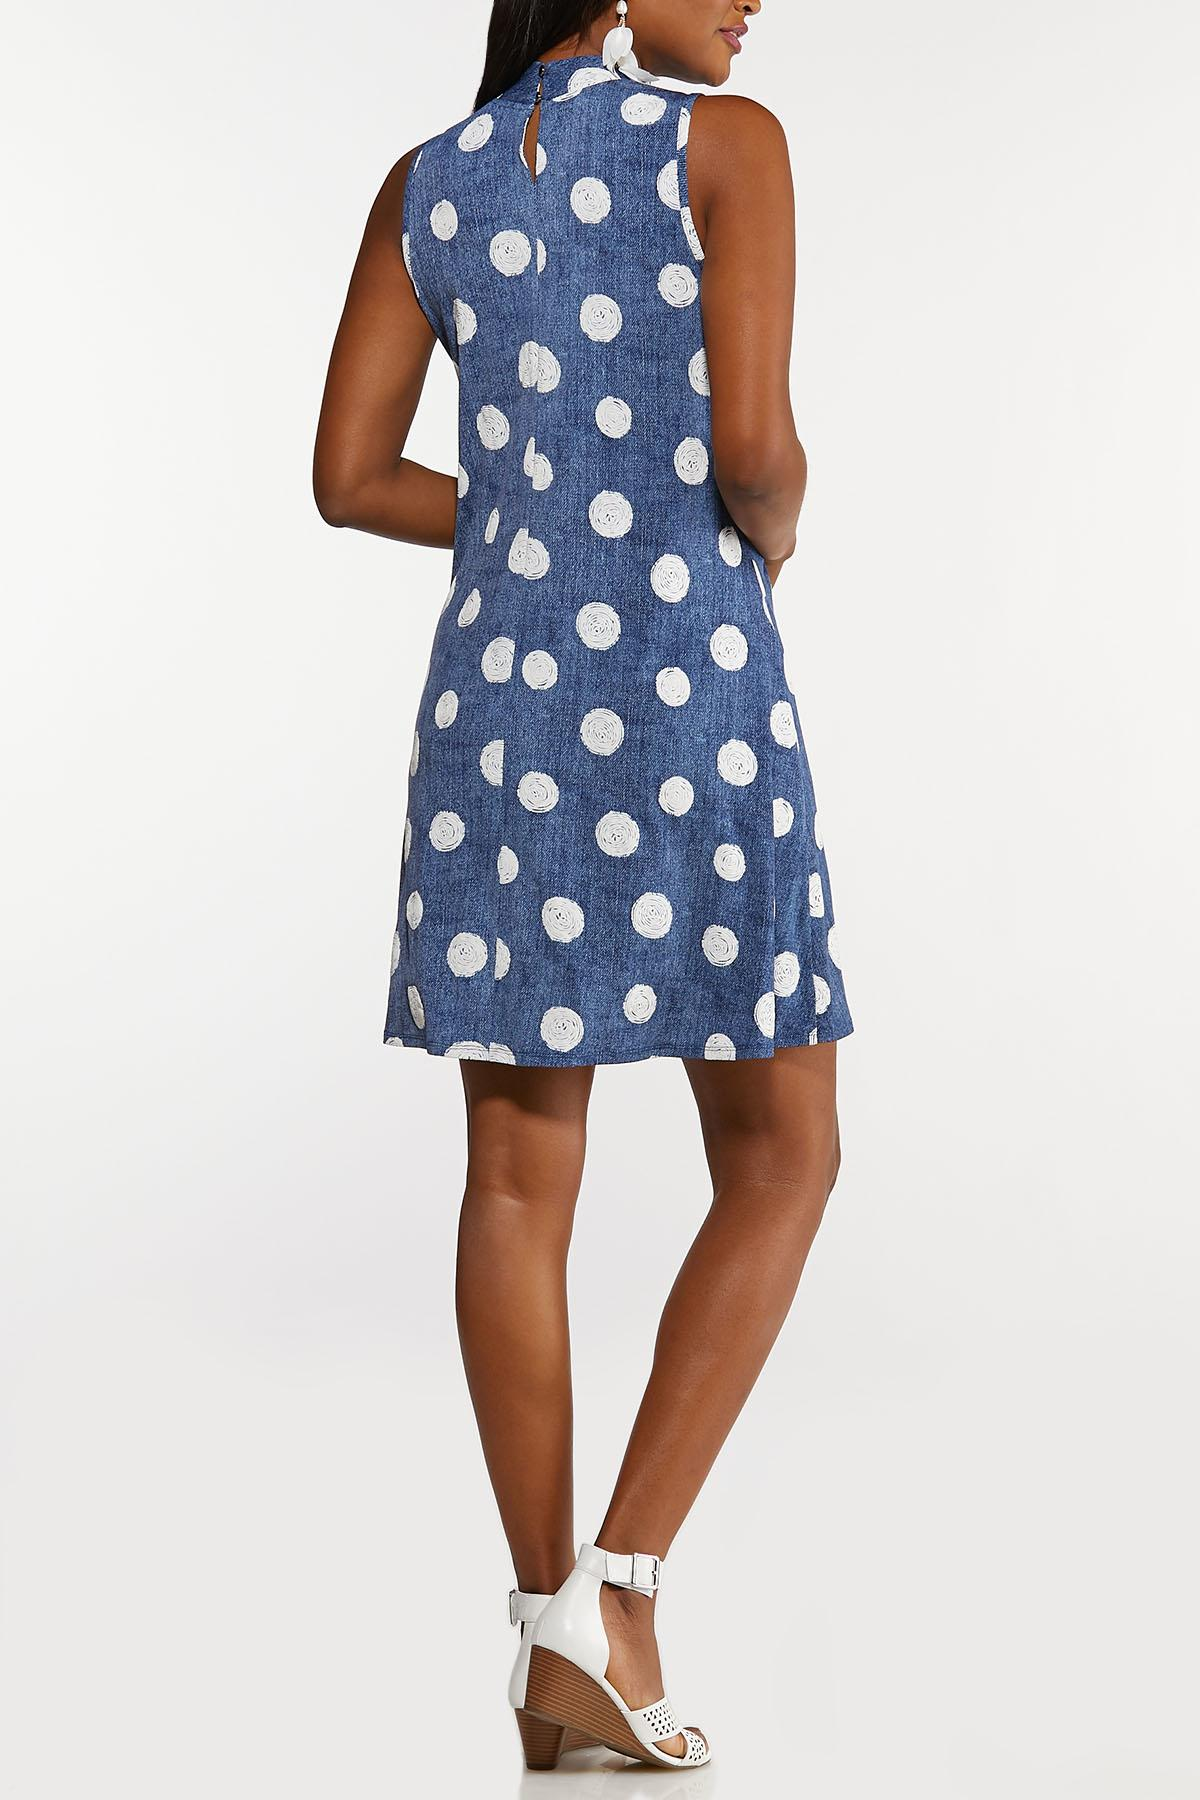 Puff Dot Swing Dress (Item #44199941)